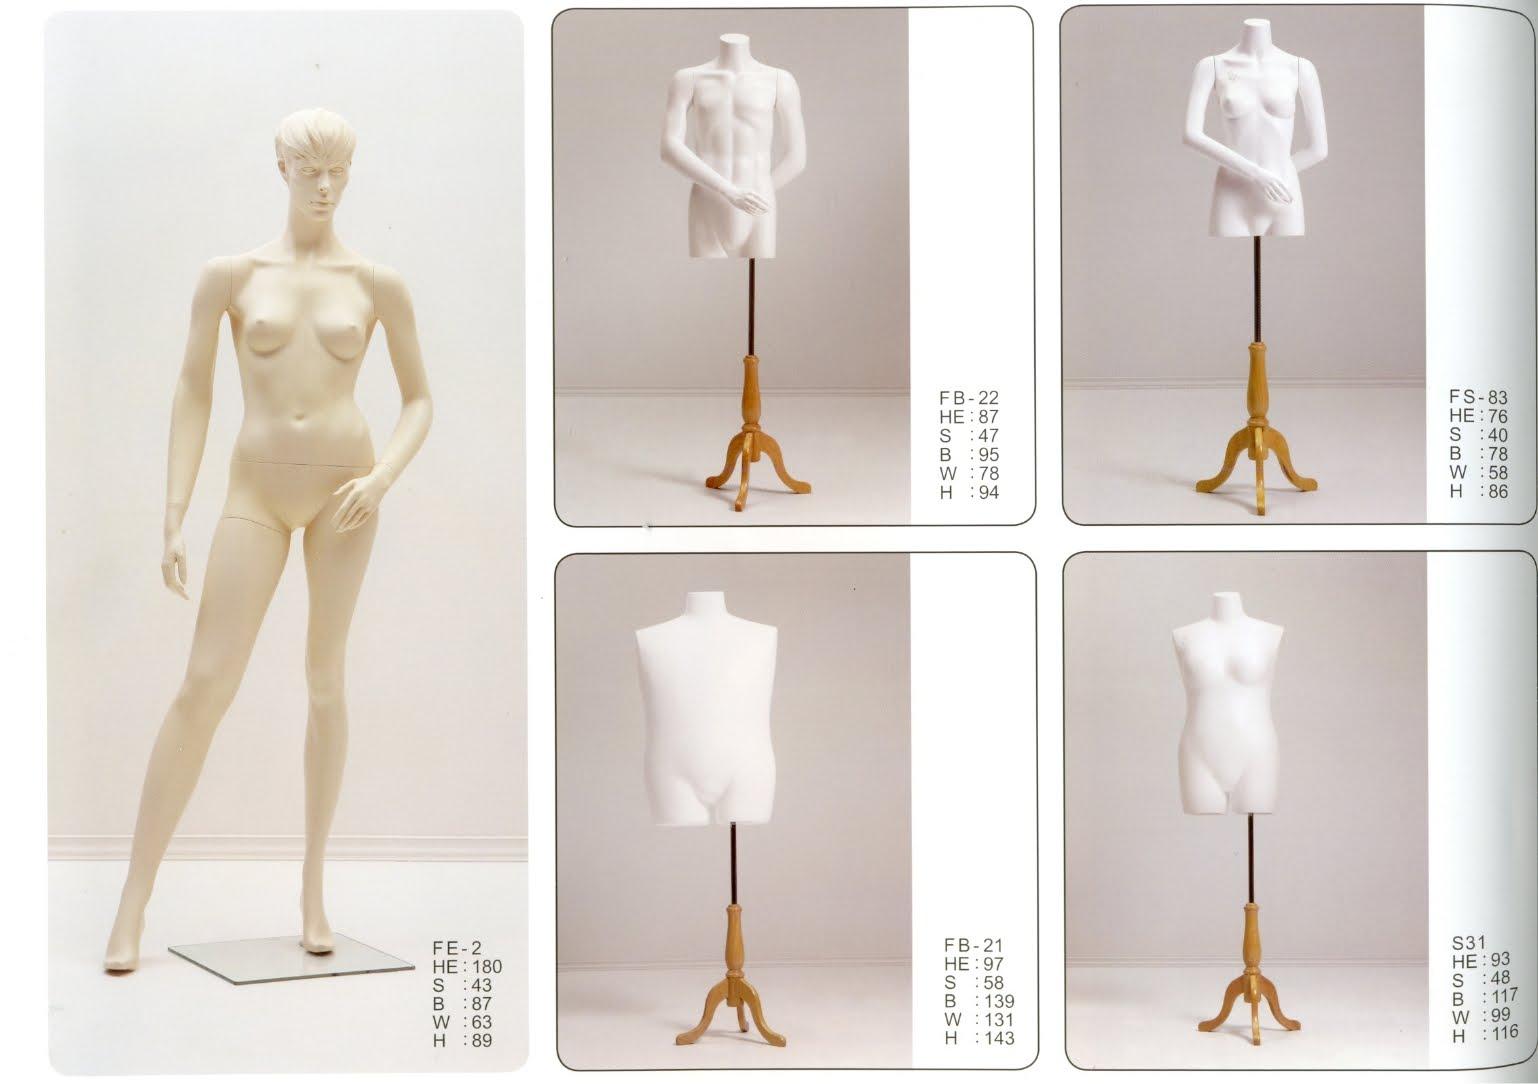 Mannequin definition